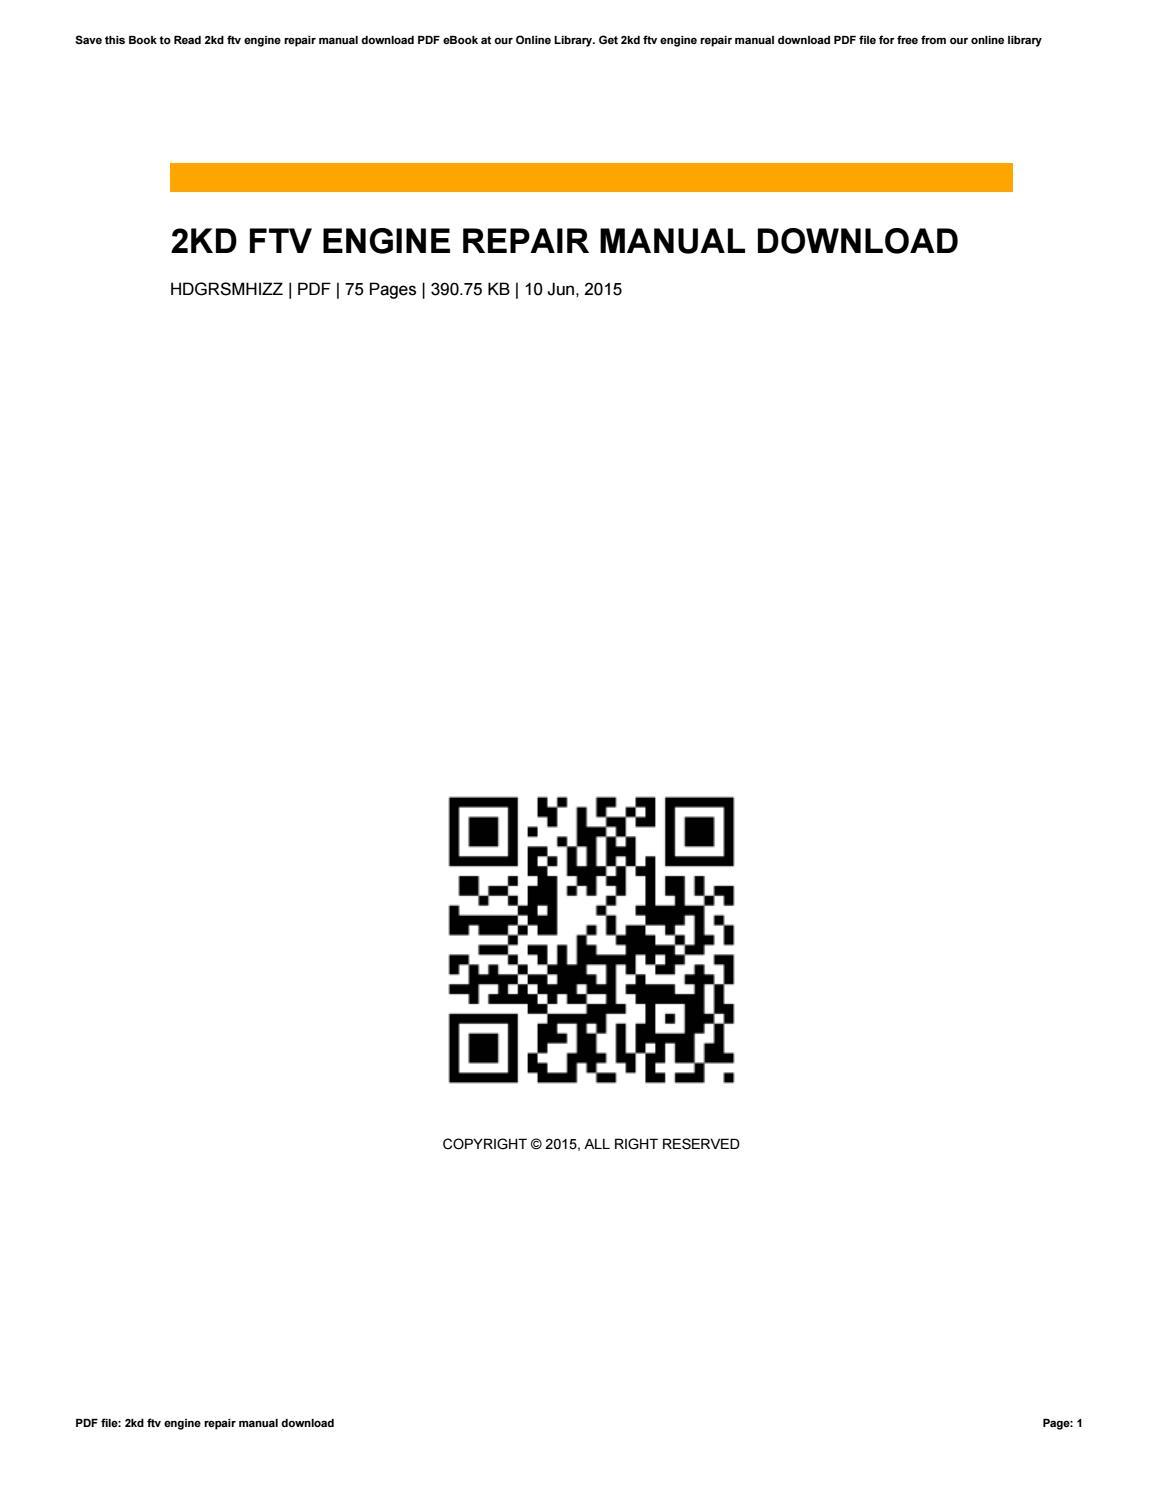 ... Array - 2kd ftv engine repair manual download by davidstroud1719 issuu  rh issuu ...